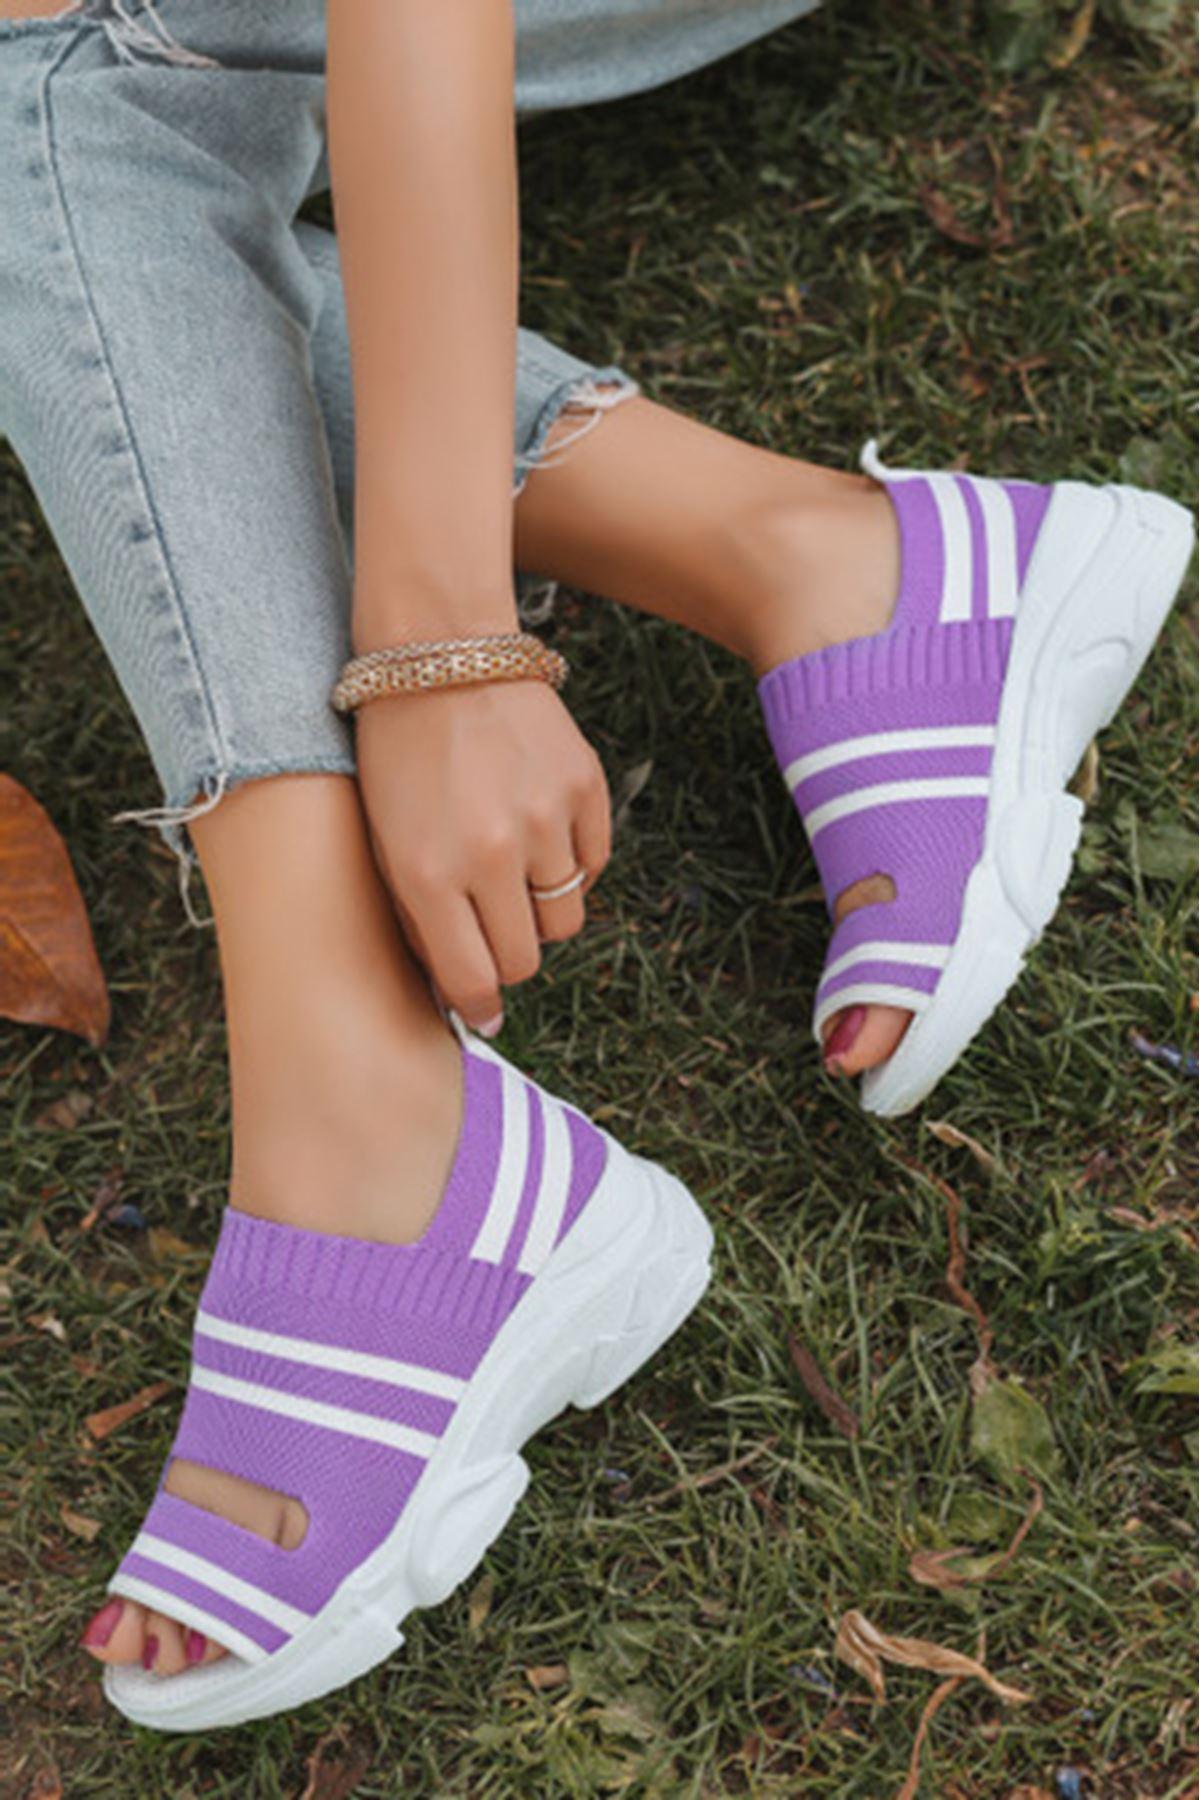 Hera Lila Triko Bayan Spor Ayakkabı